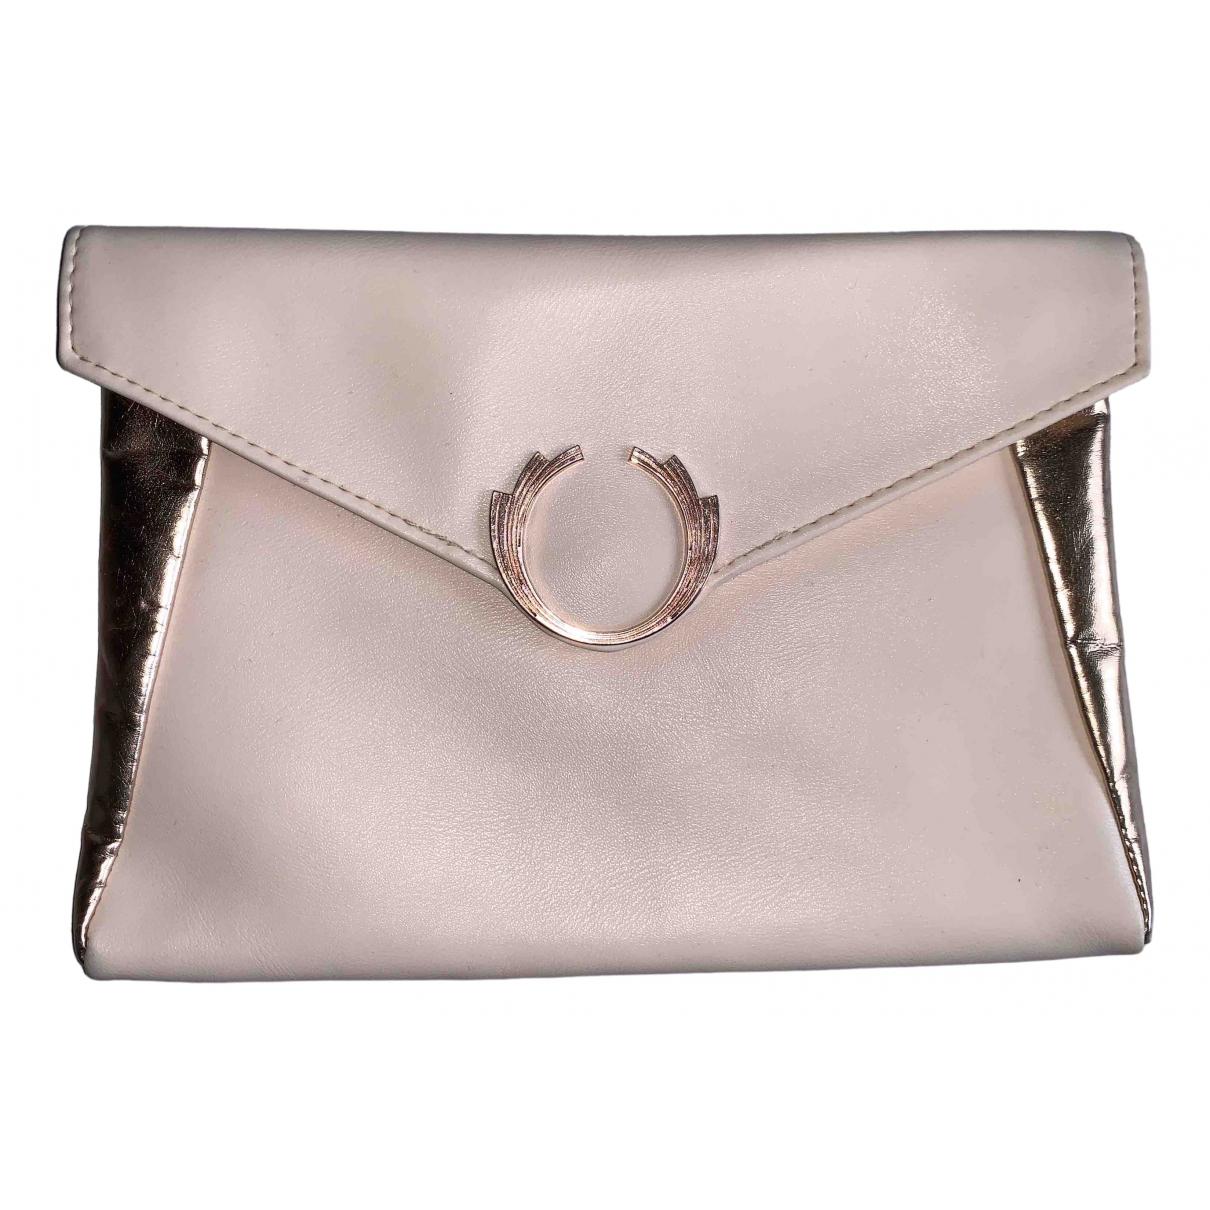 Paco Rabanne \N Beige Leather Clutch bag for Women \N